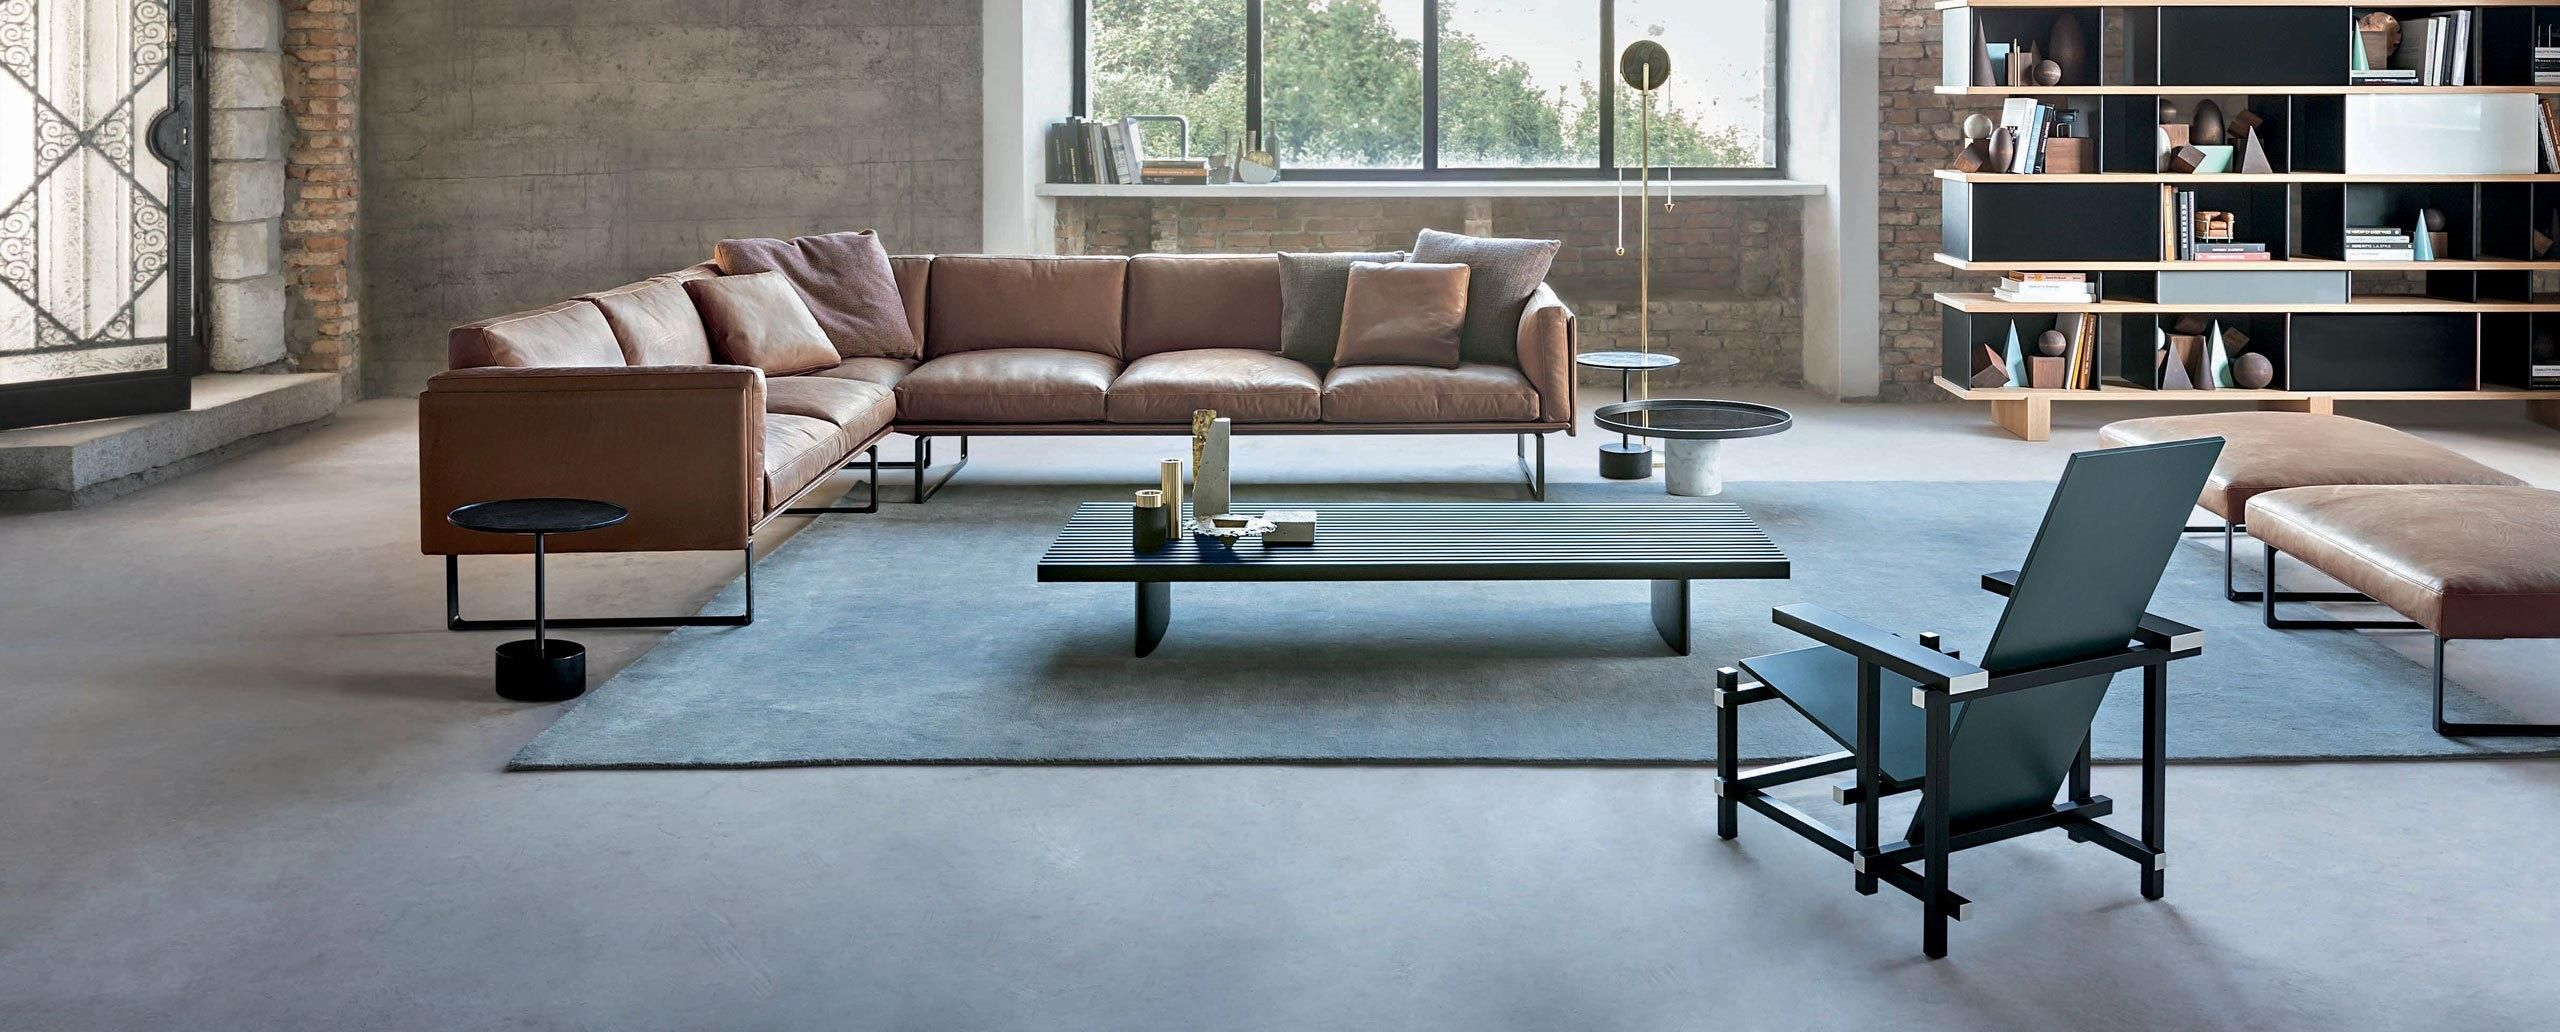 202 8 Piero Lissoni Cassina Furniture Pinterest